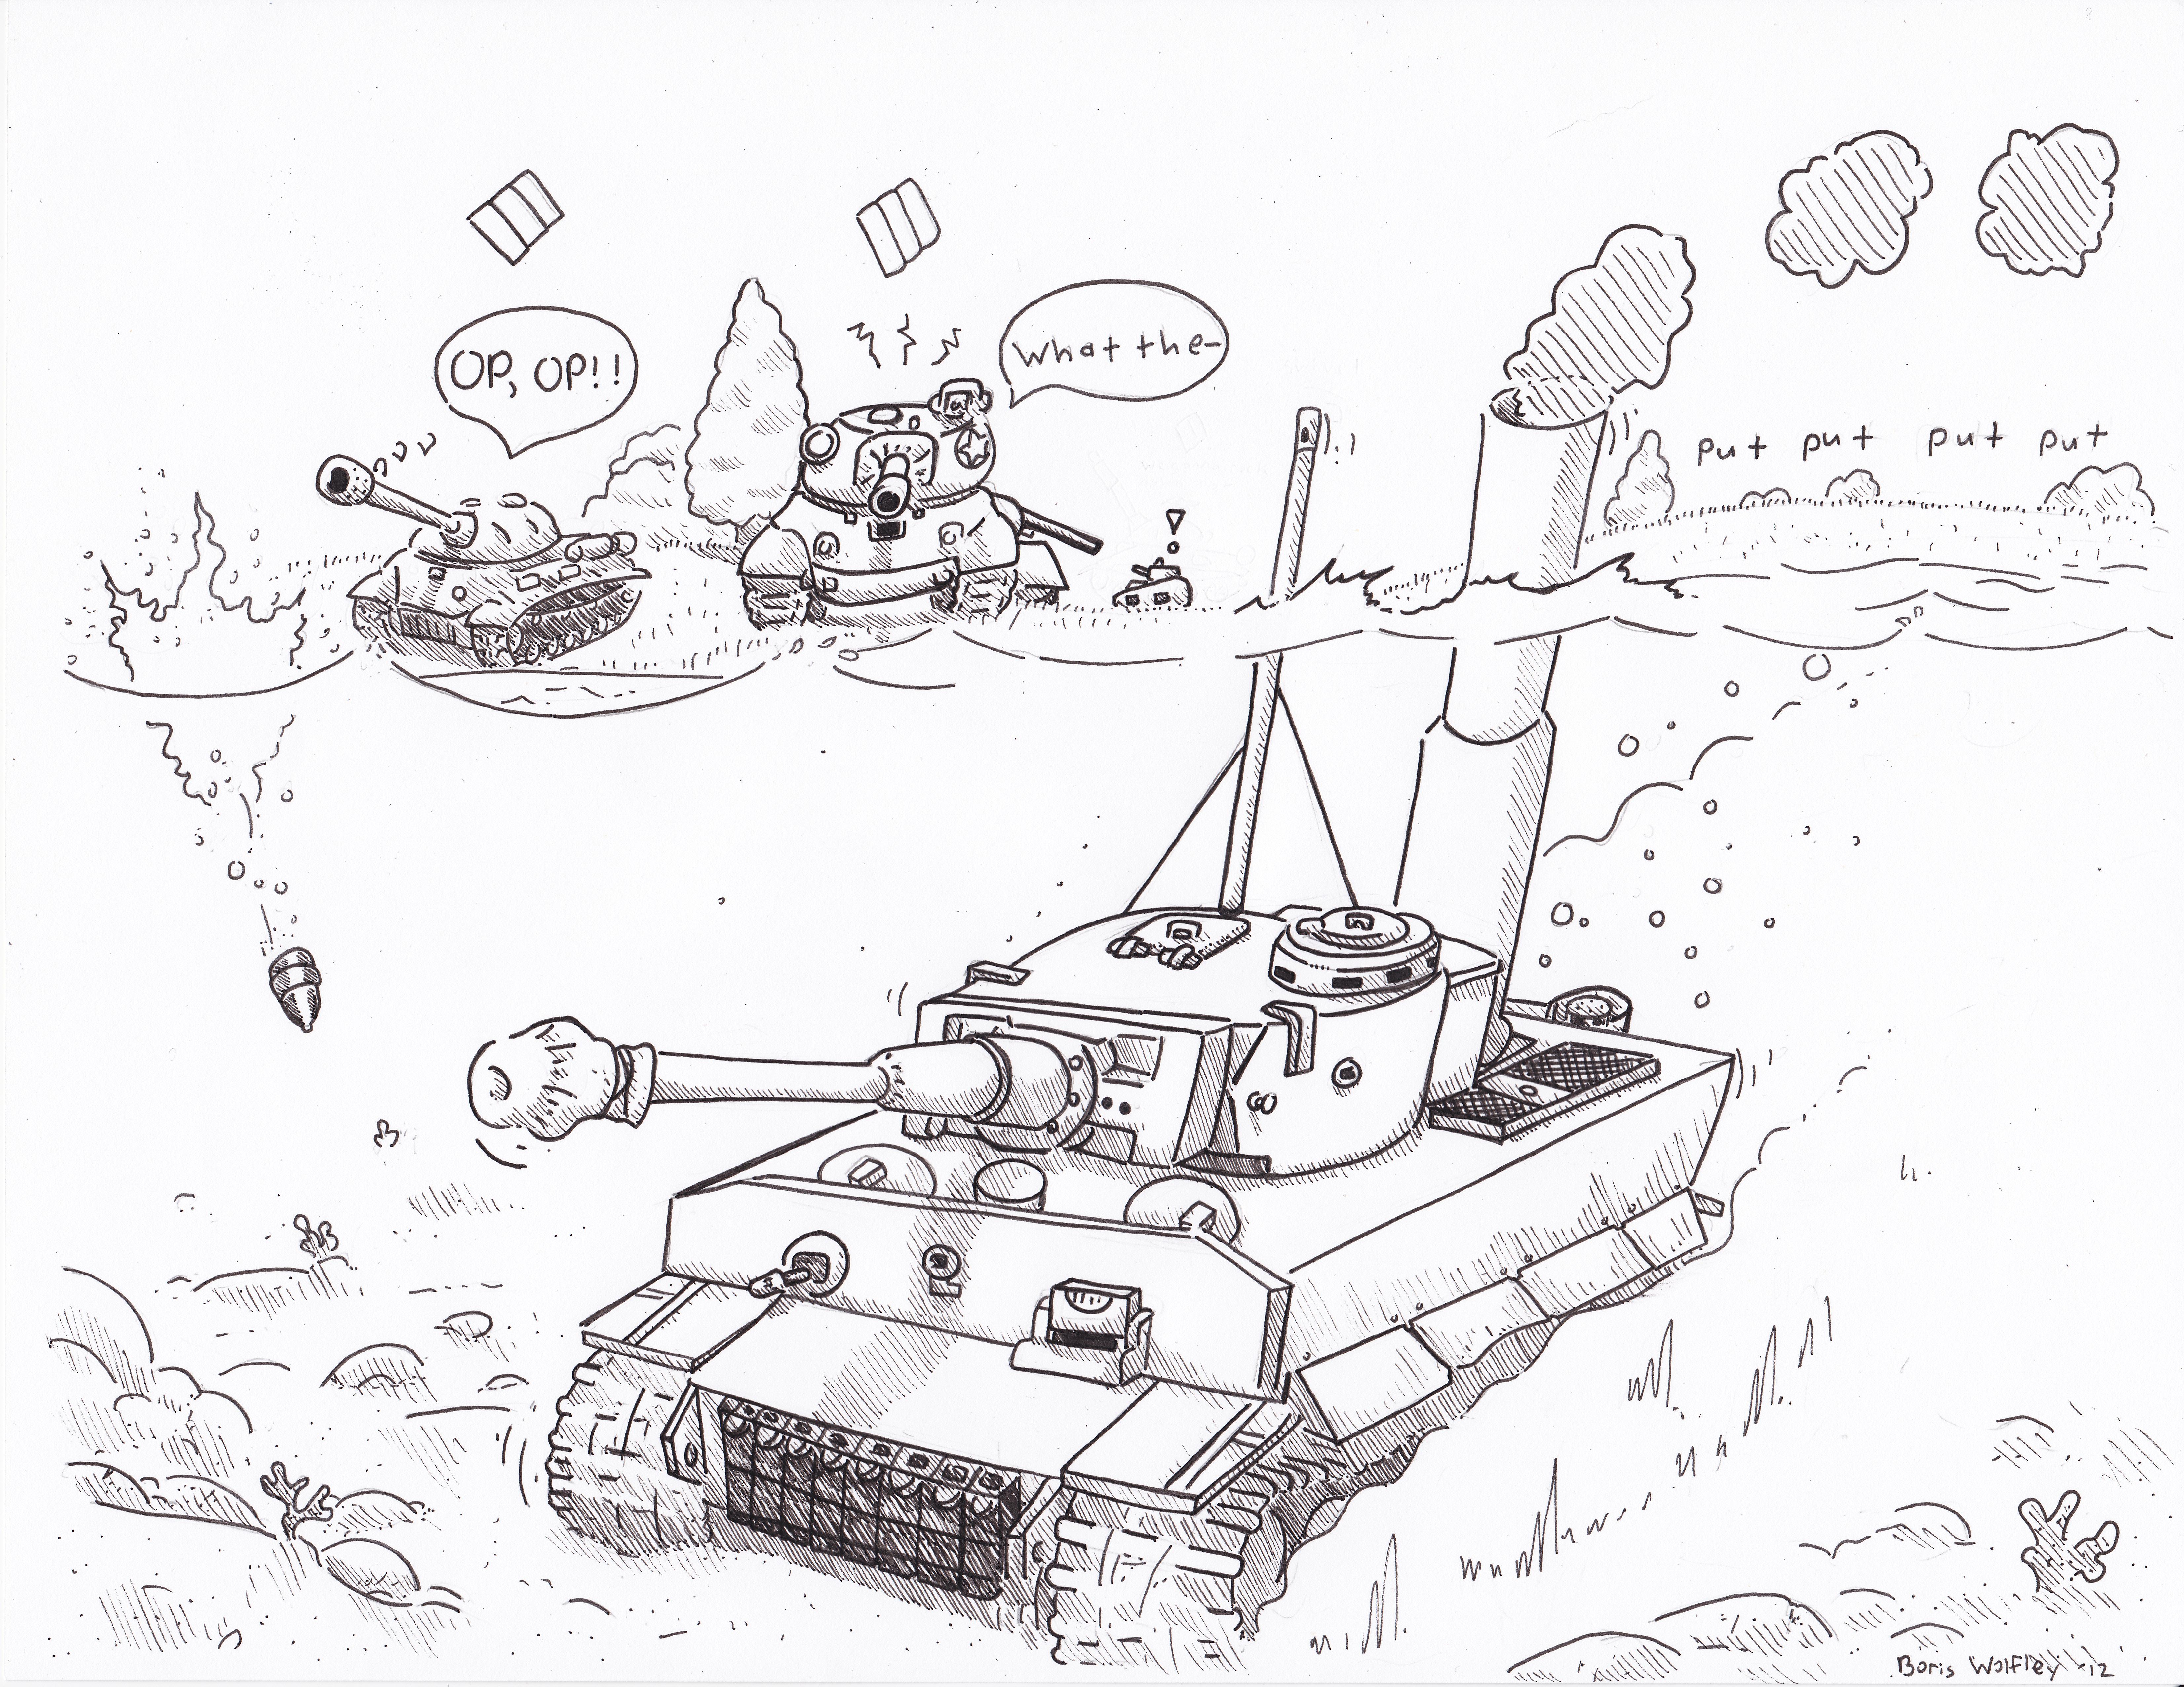 6608x5104 Got Tank By Shank117 A Hand Drawn Sketch An E 100 World